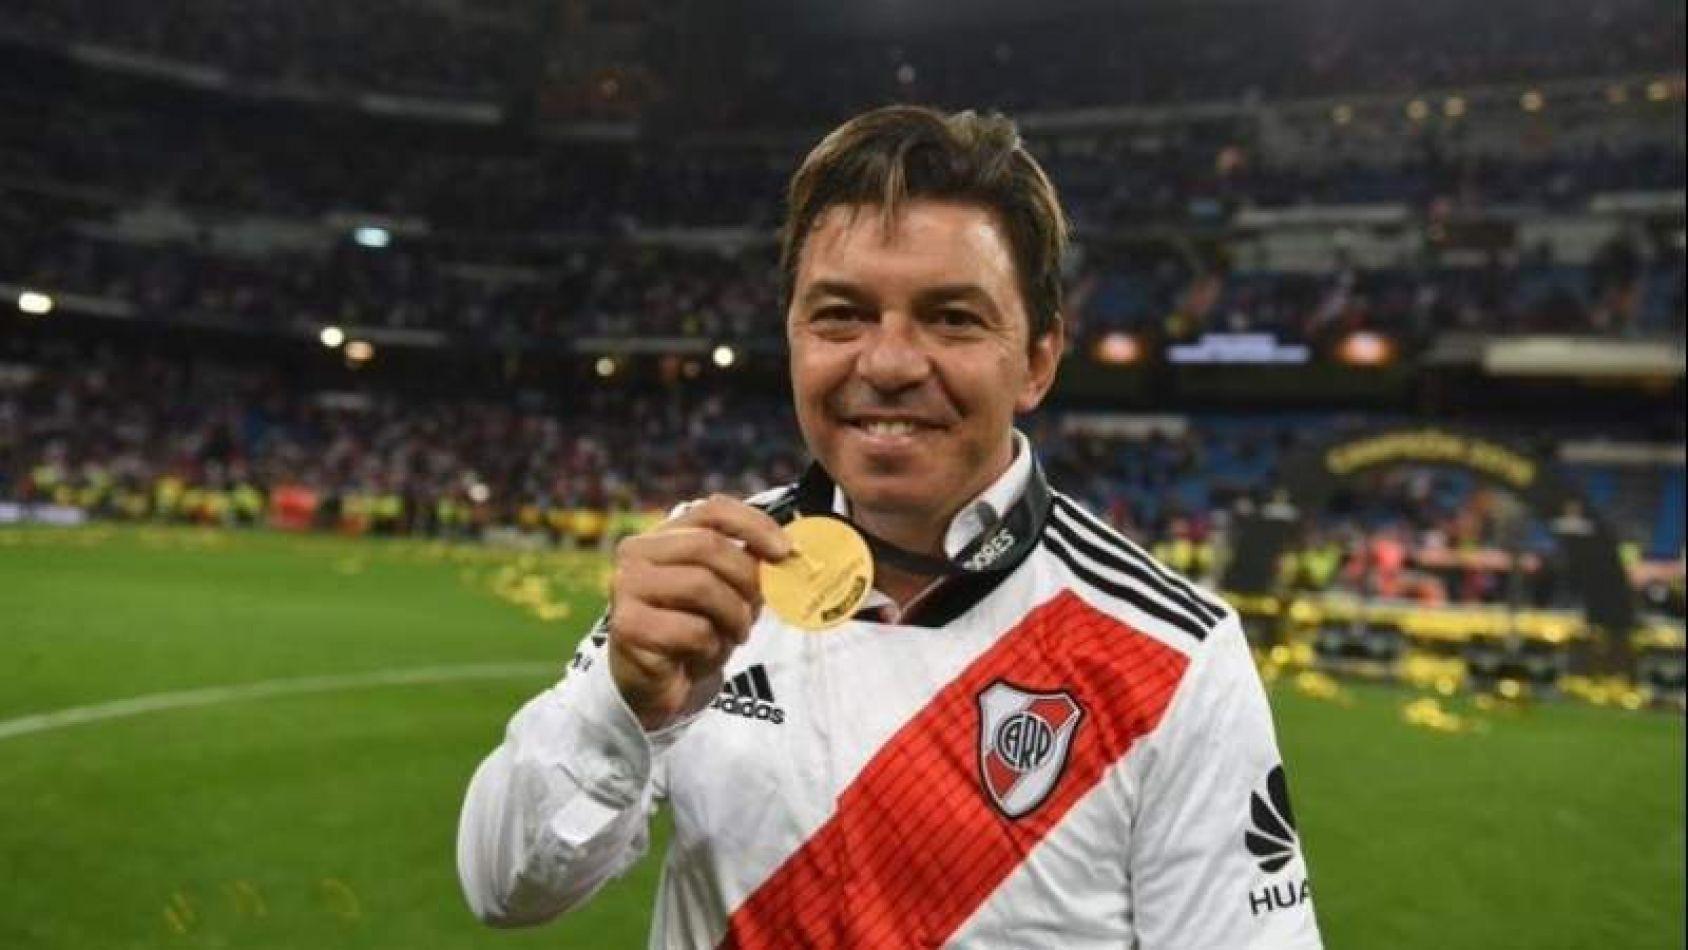 Gallardo se ubicó como tercero en el ranking Fifa